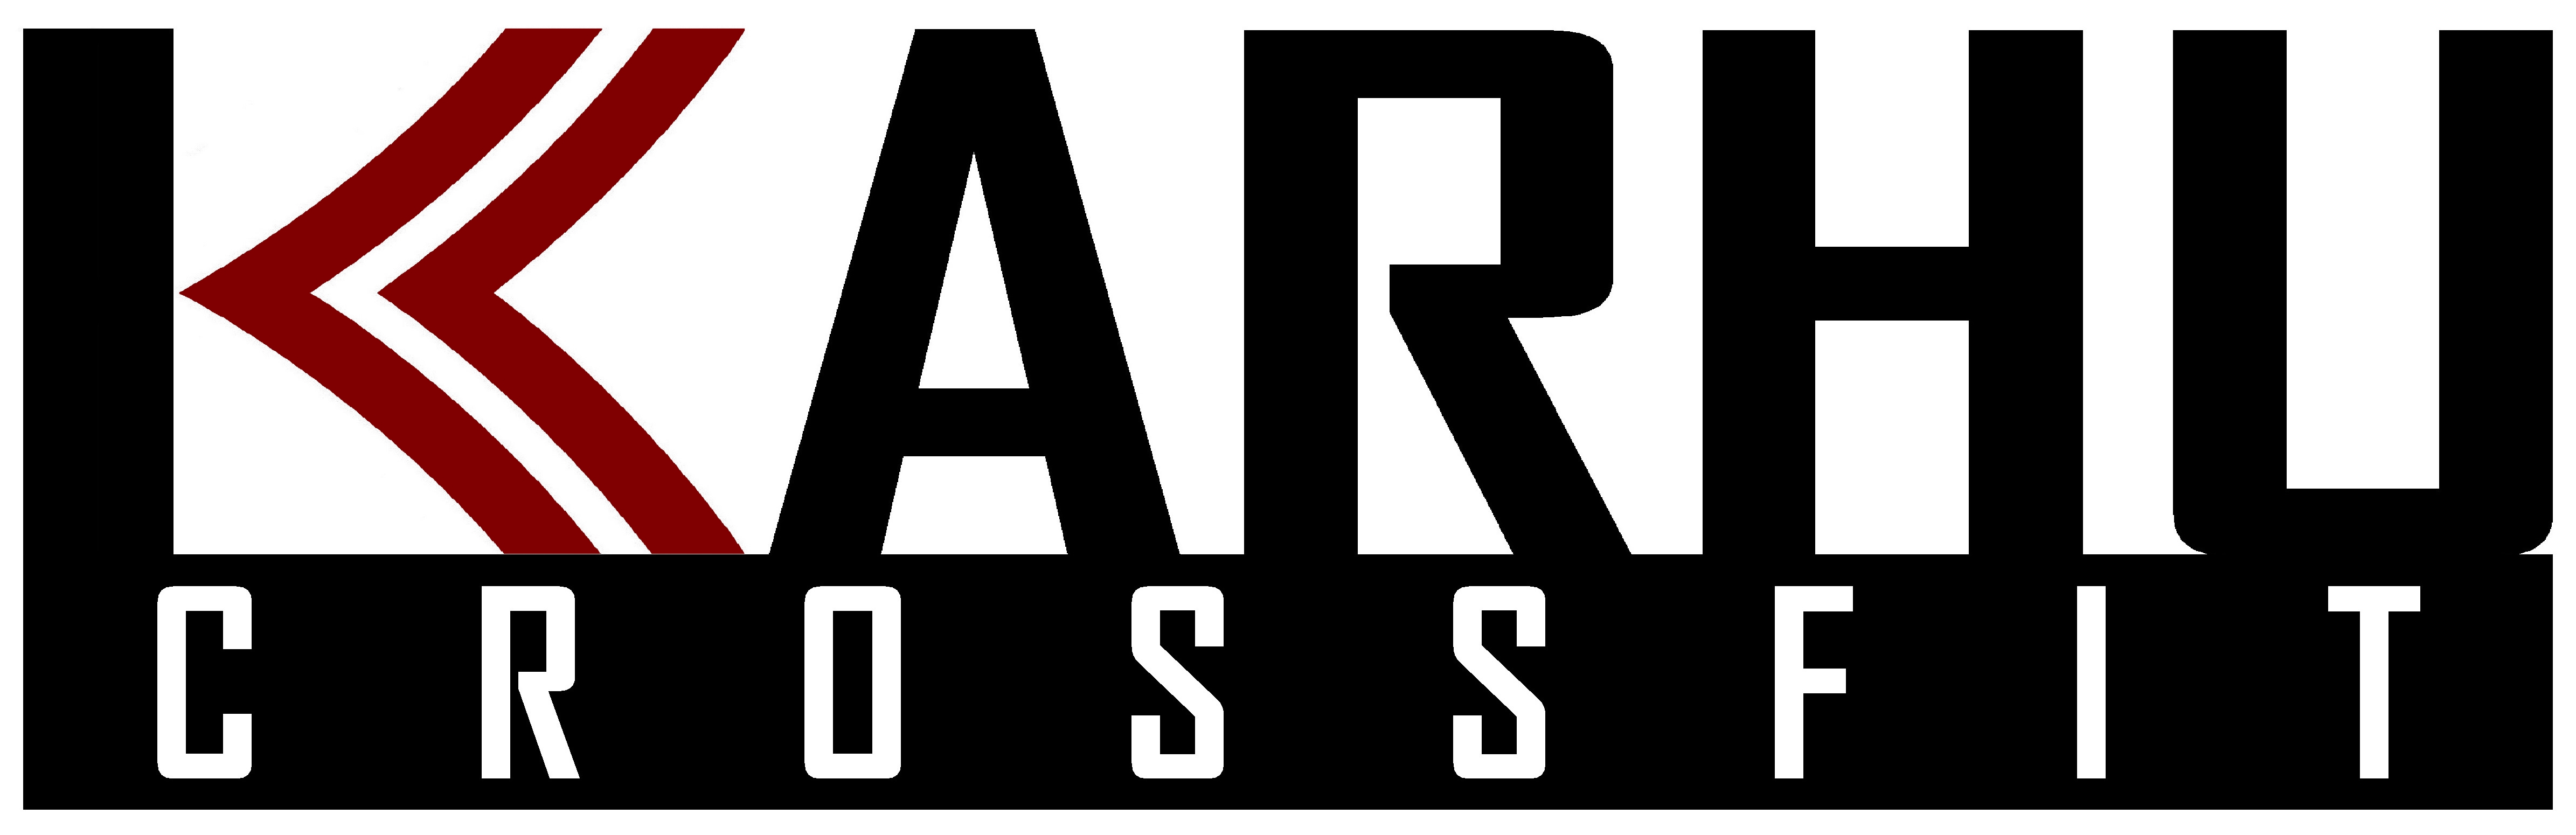 Karhu CrossFit Ruuvikatu 3, Kotka